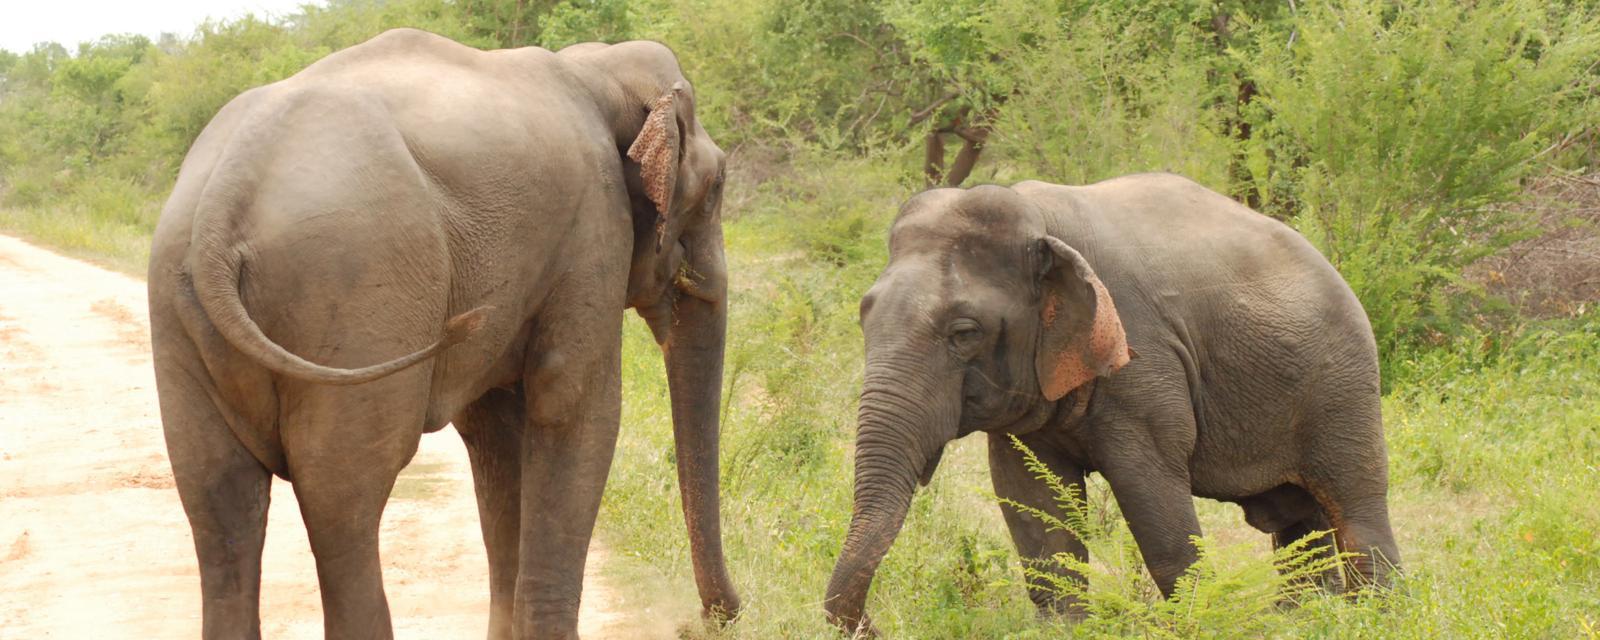 Earth - Dwarf elephant beats up big rival